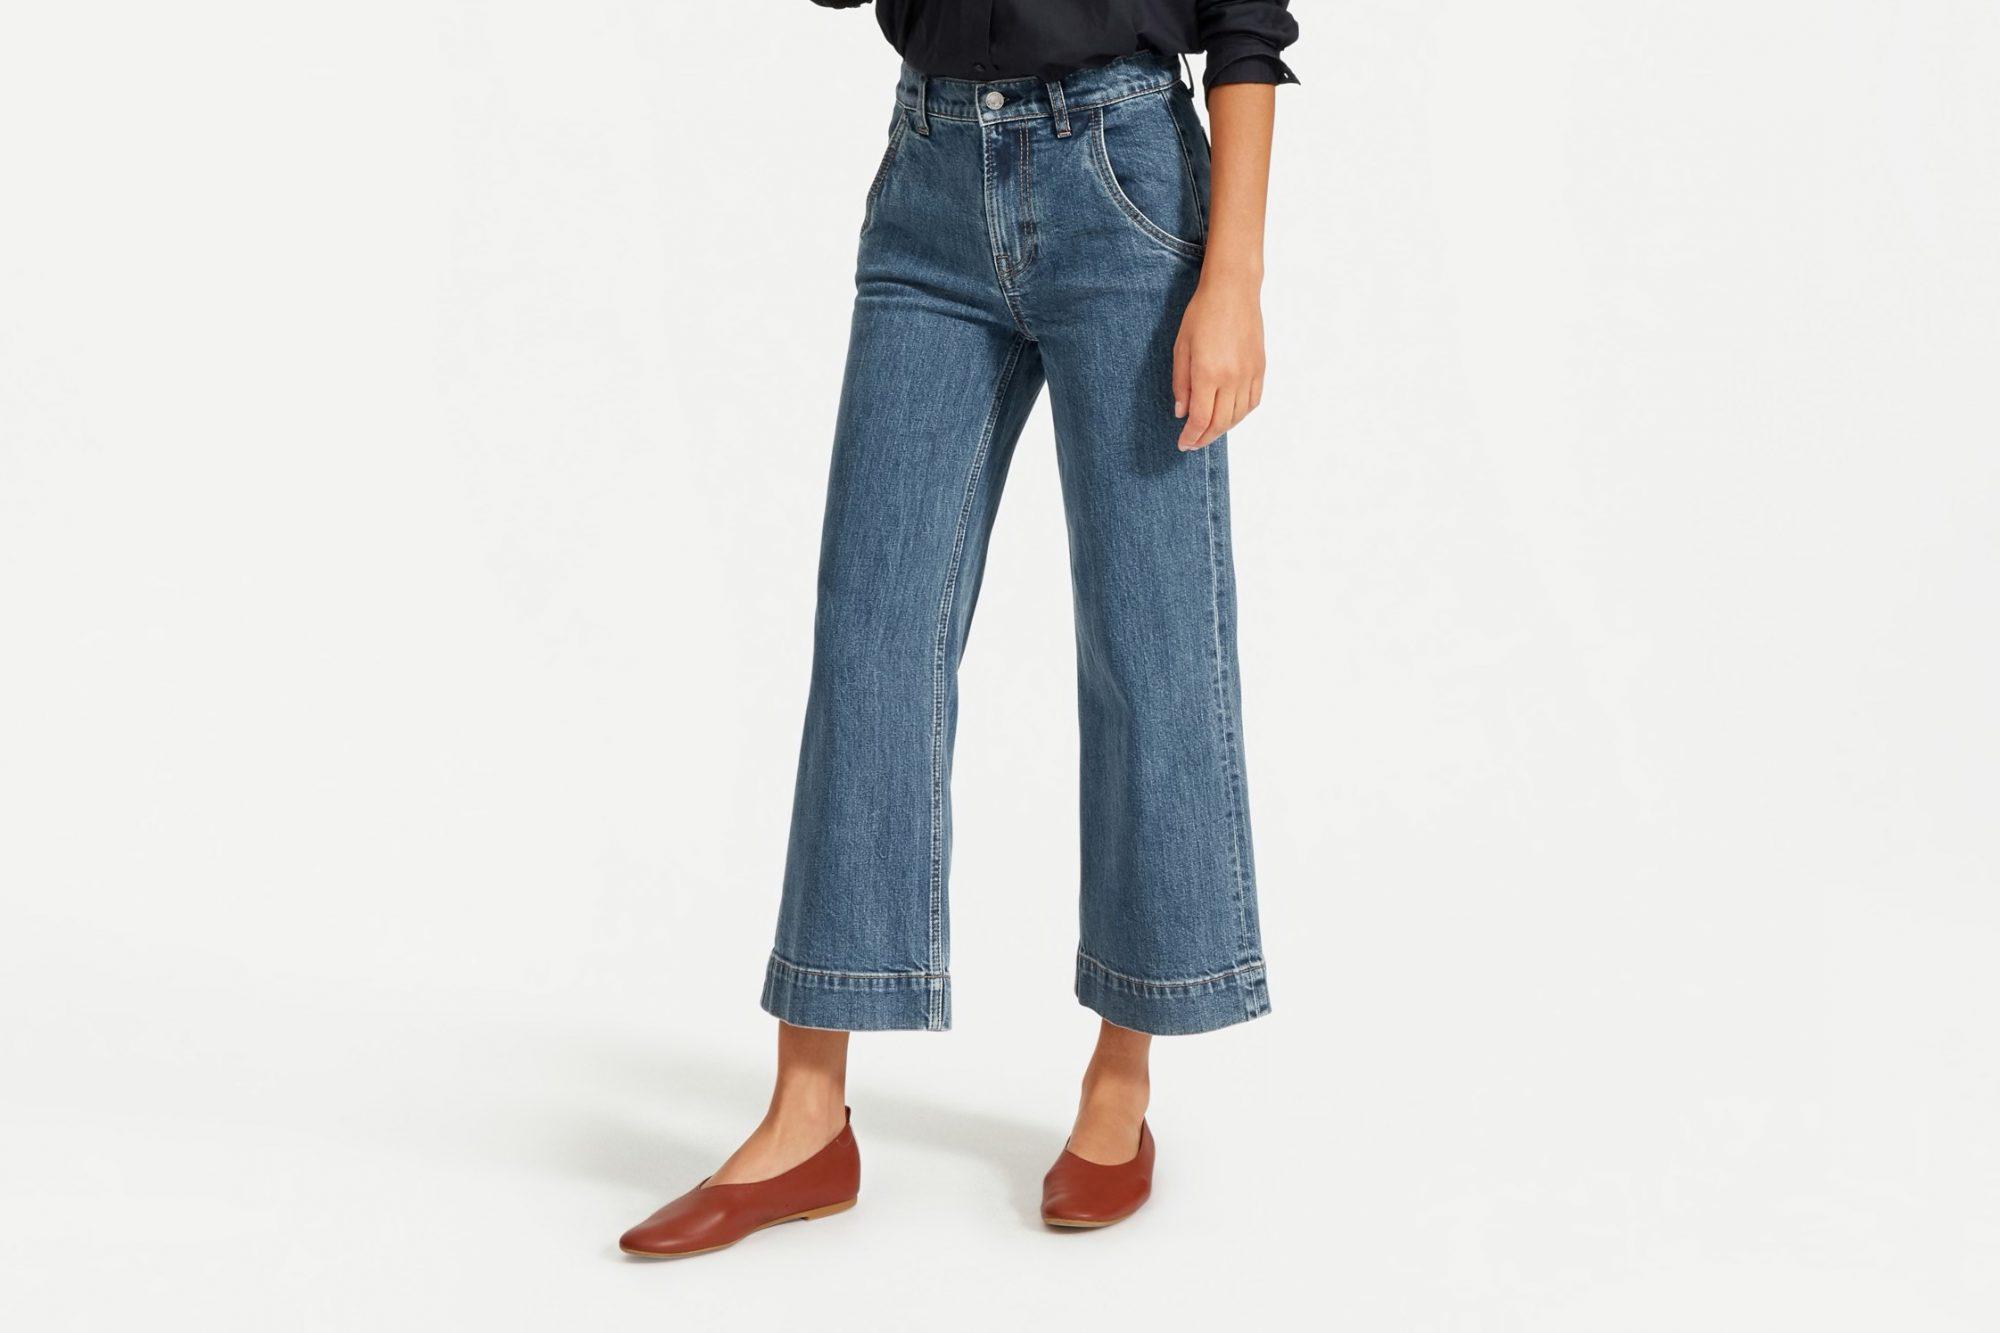 everlane high waisted wide leg jeans, best high waisted jeans